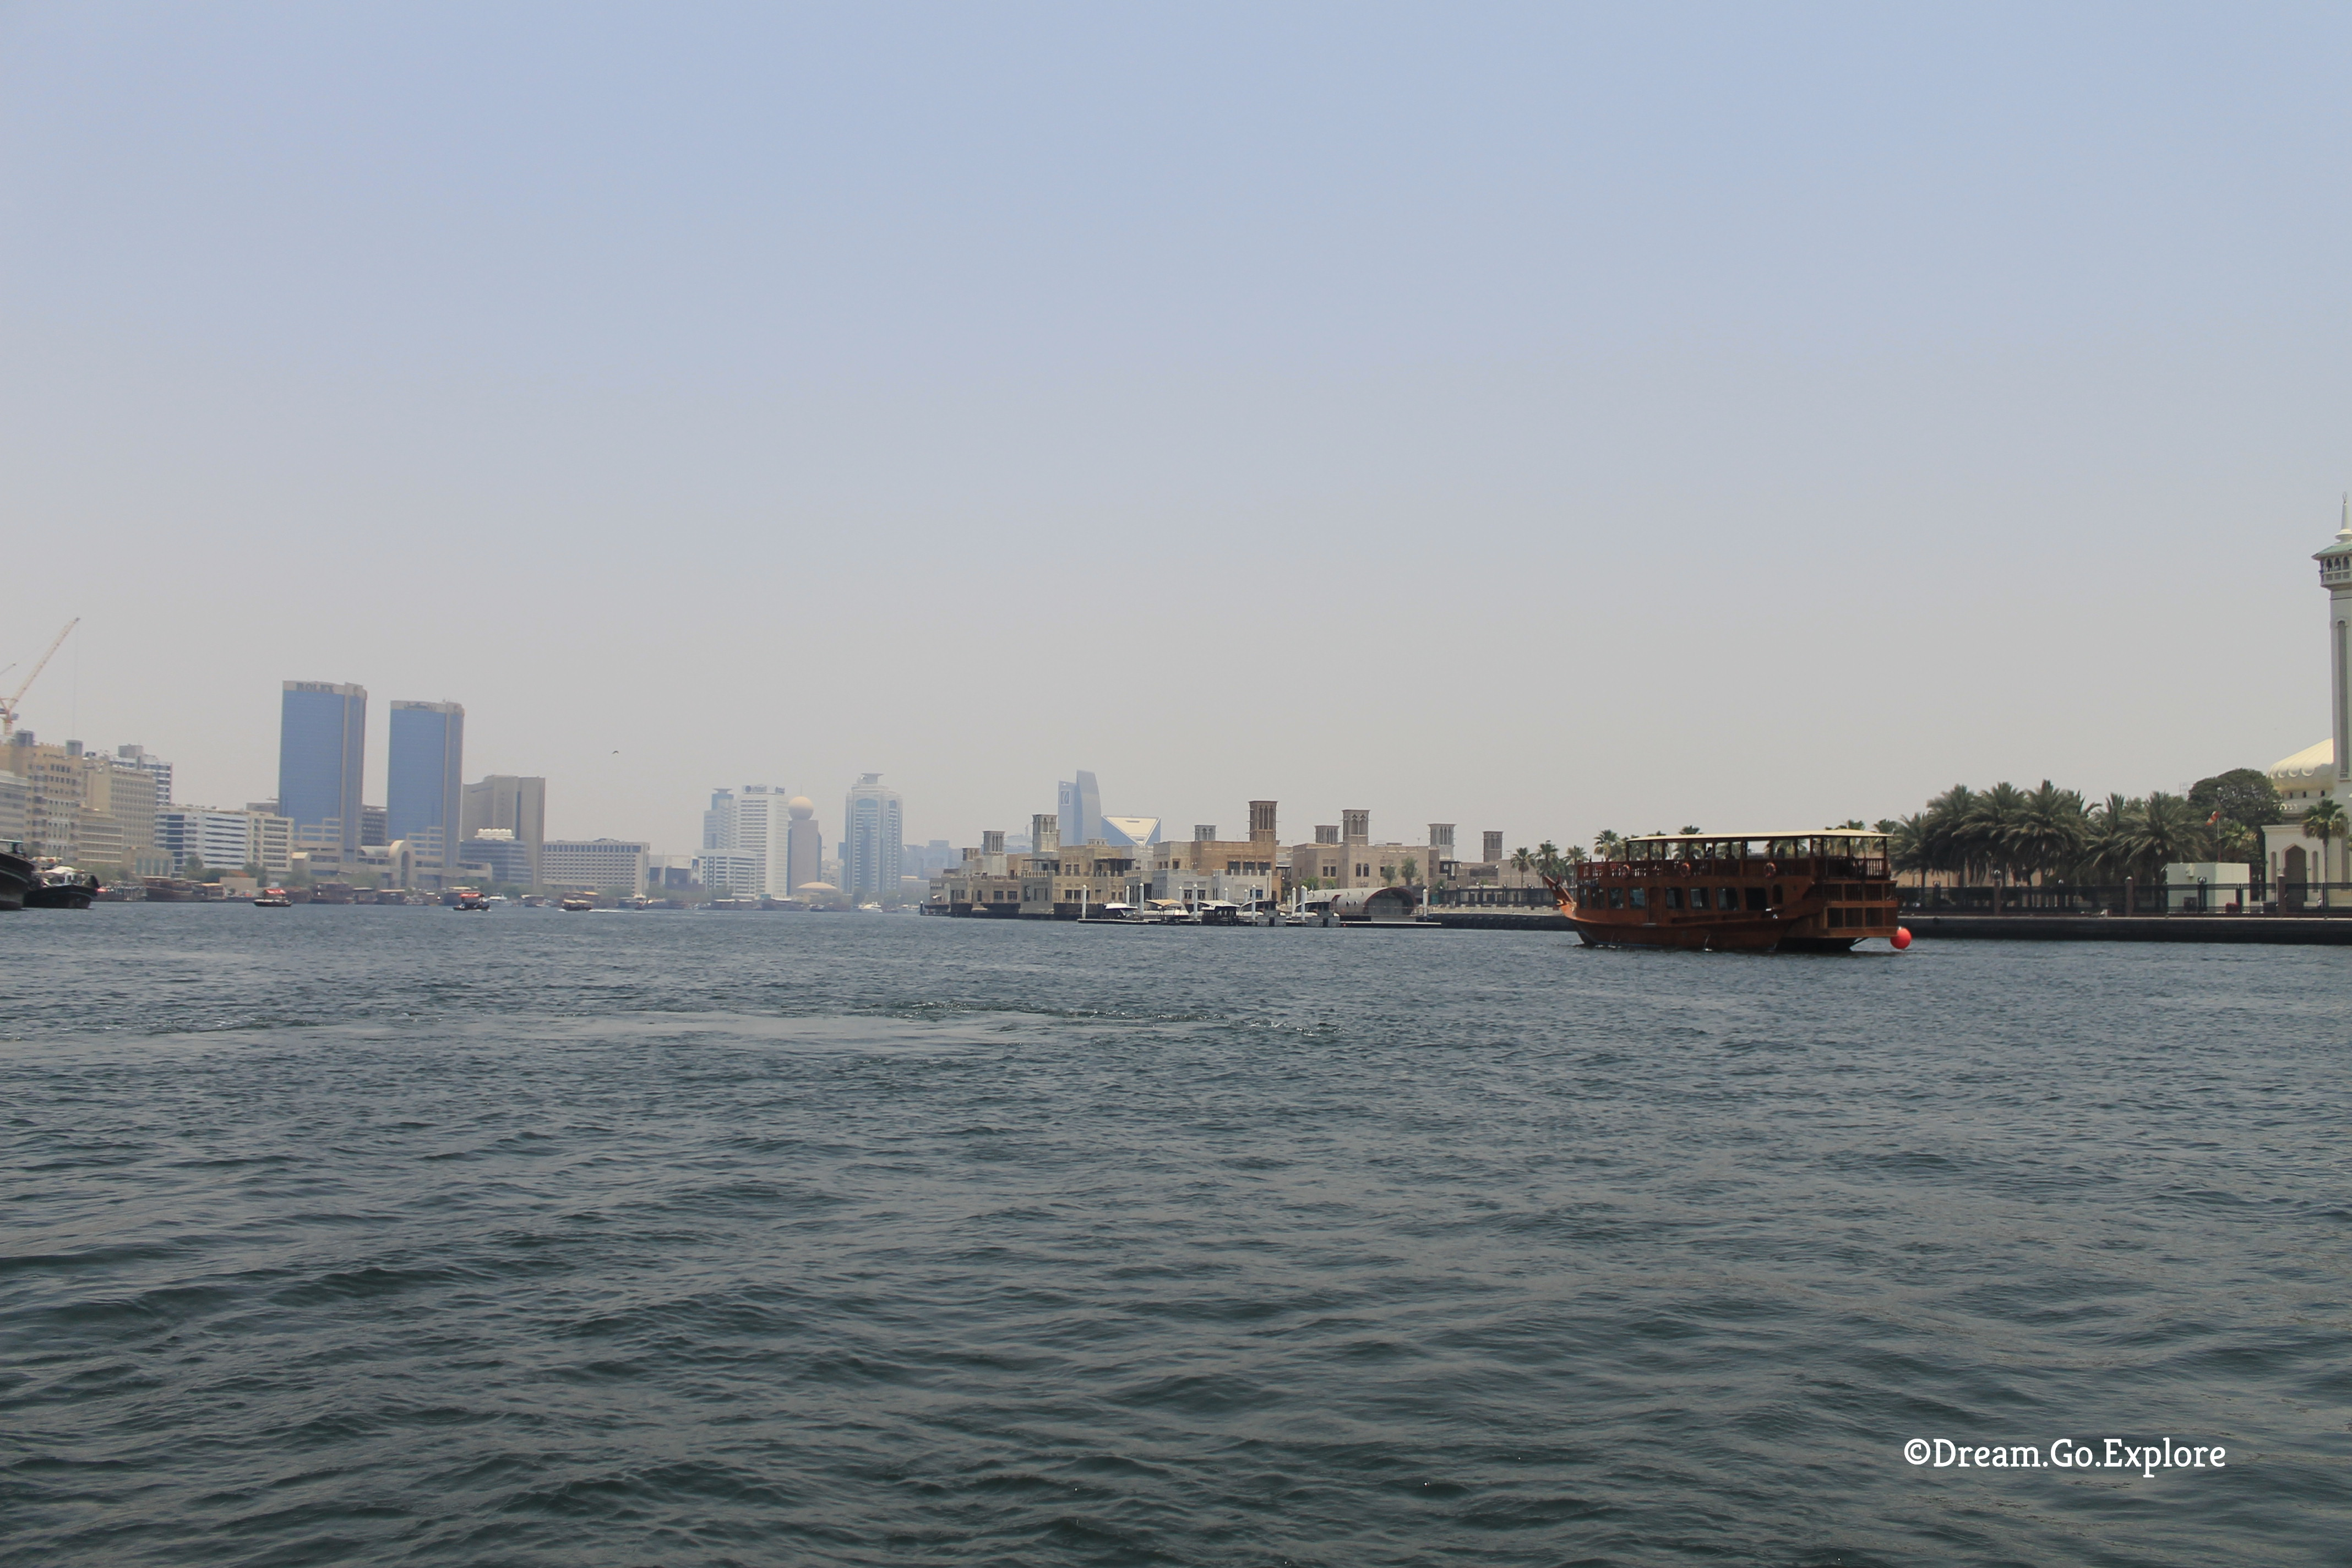 A visit to old Dubai (United Arab Emirates – Dubai) – Eine Reise ins alte Dubai (Vereinigte Arabische Emirate – Dubai)